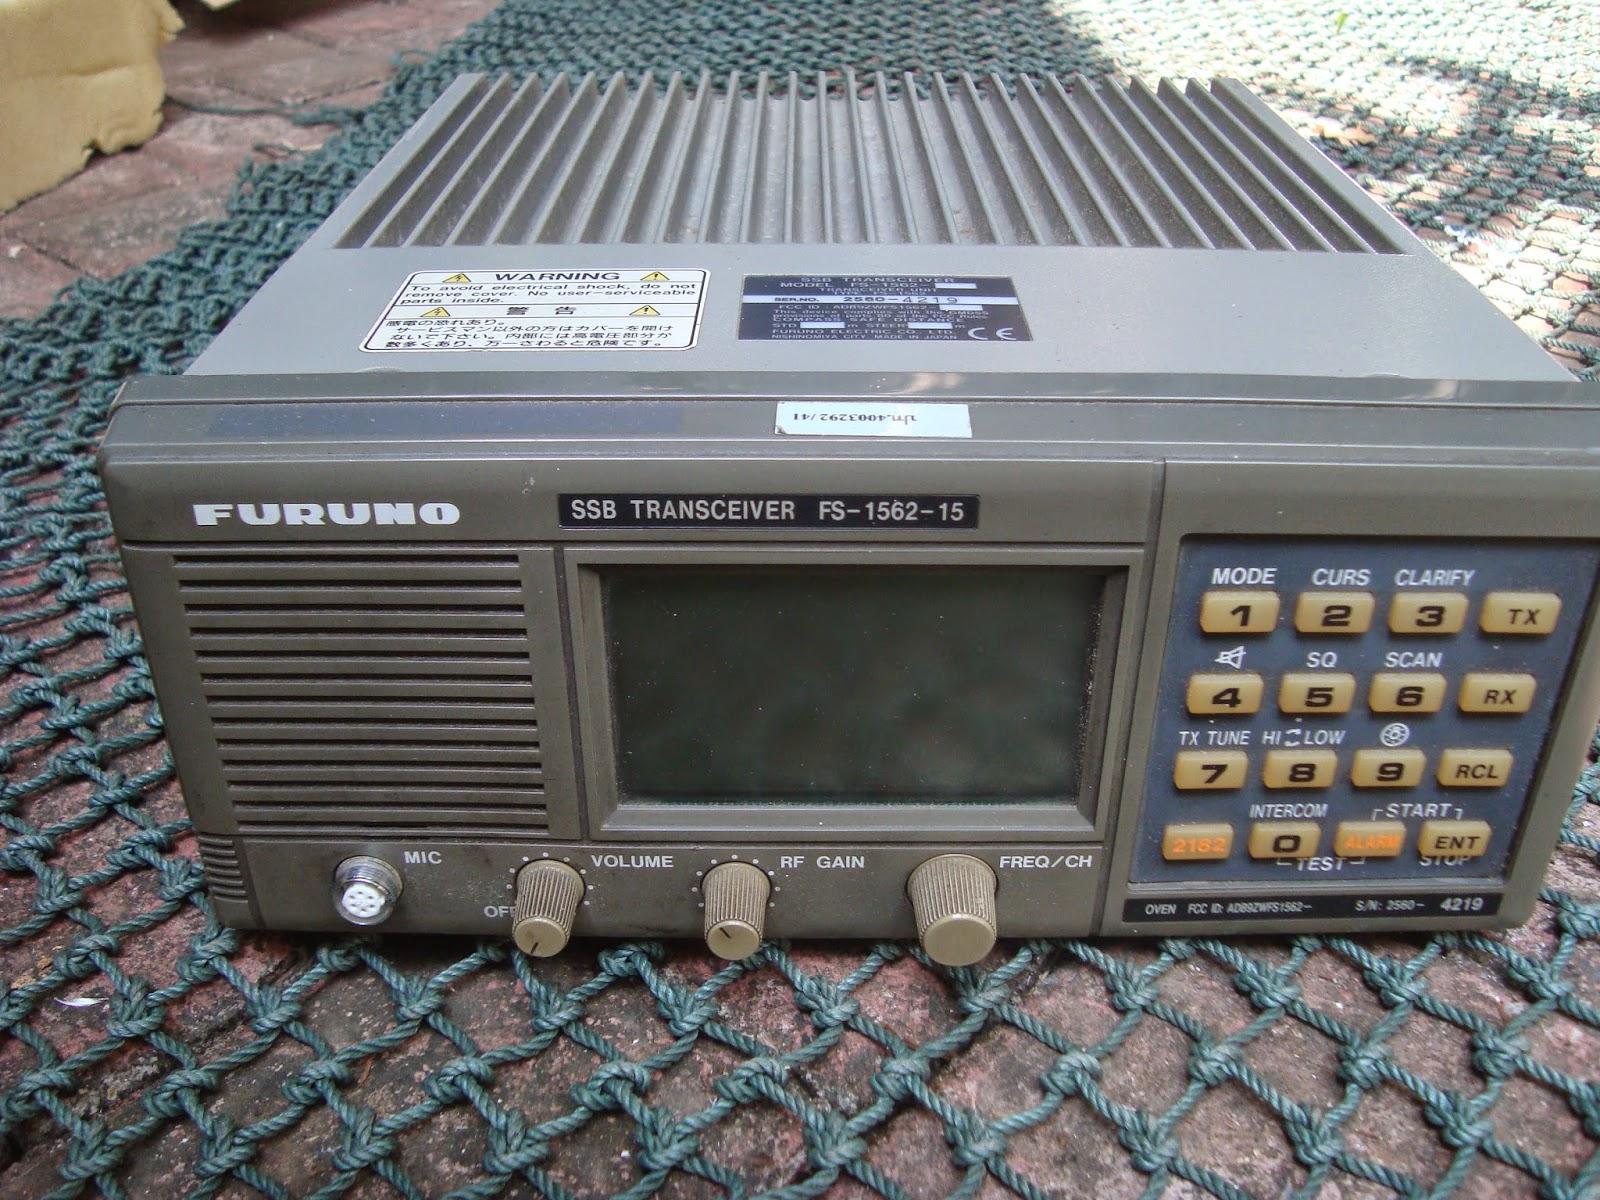 RADIO SELLER: Furuno FS 1562-15 HF Professional Transceiver